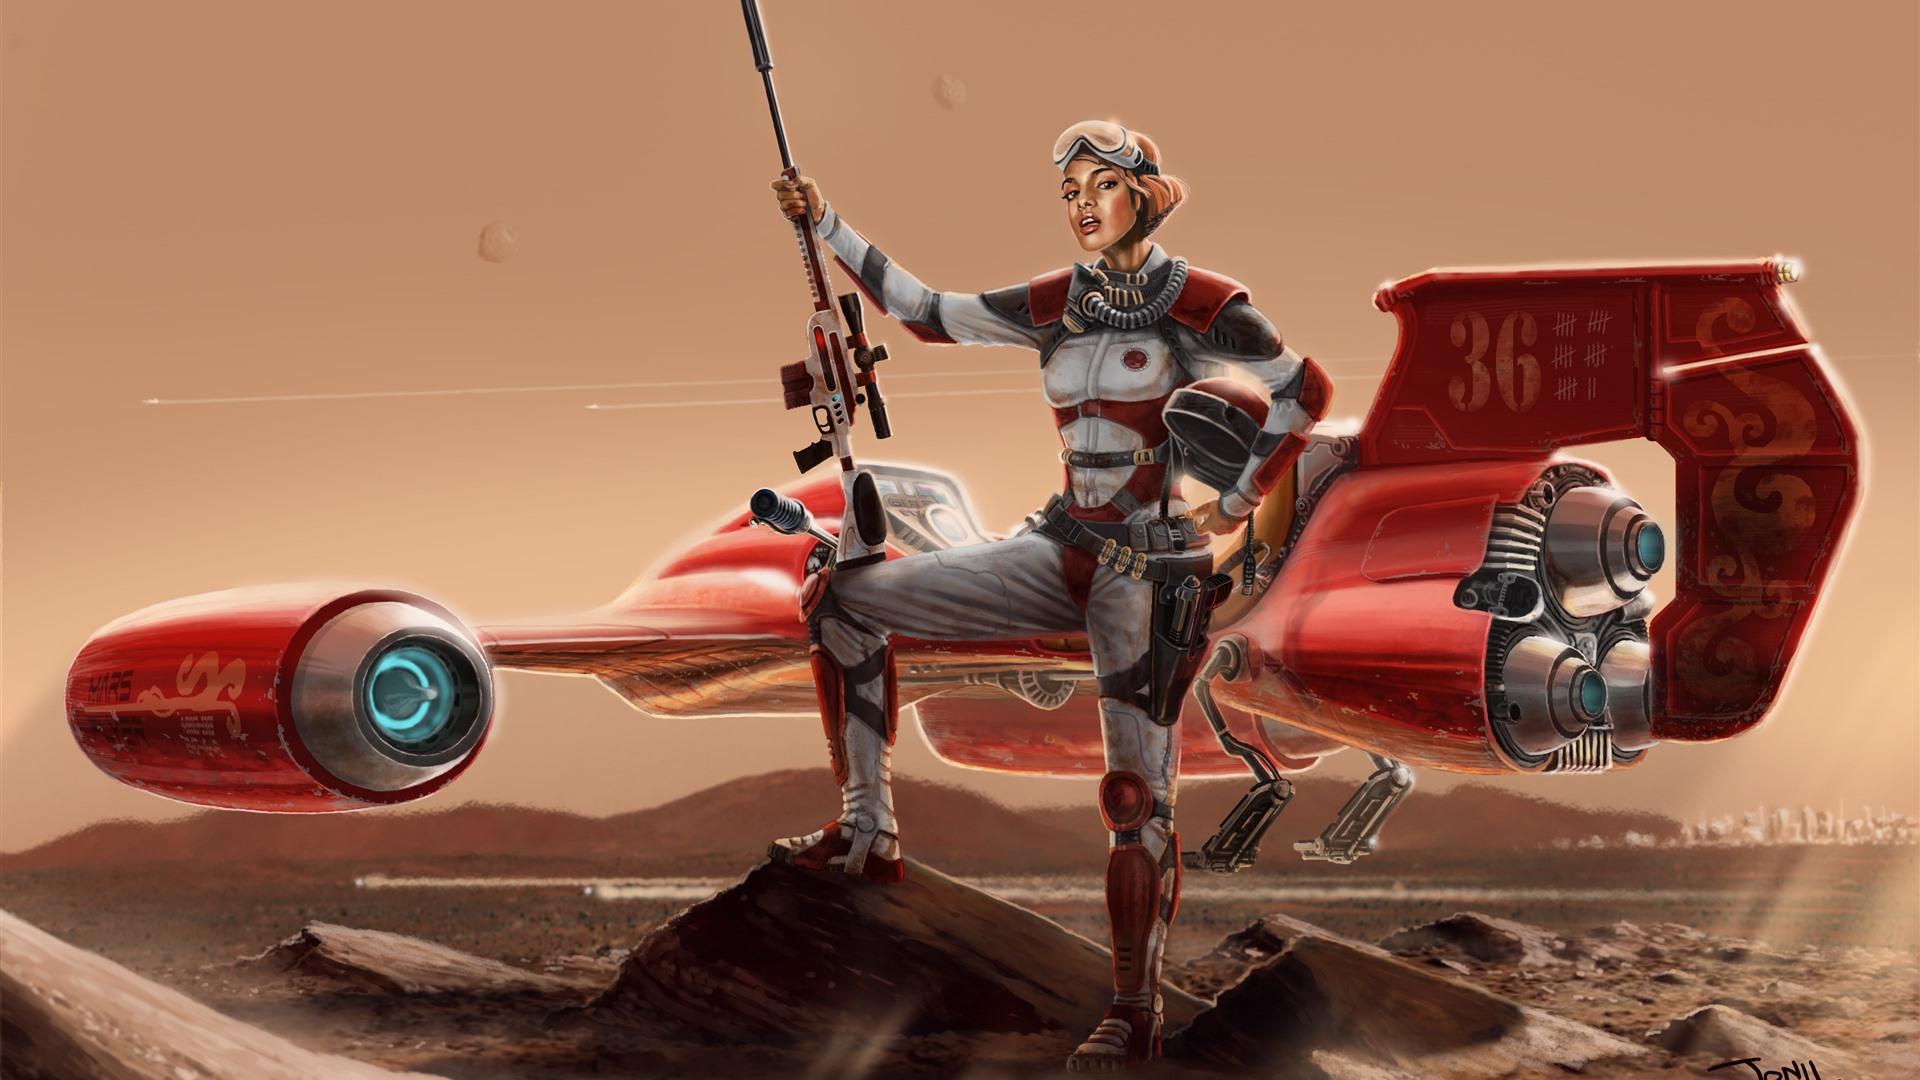 Wallpaper Fantasy Girl Aircraft Future Sci Fi 3840x2160